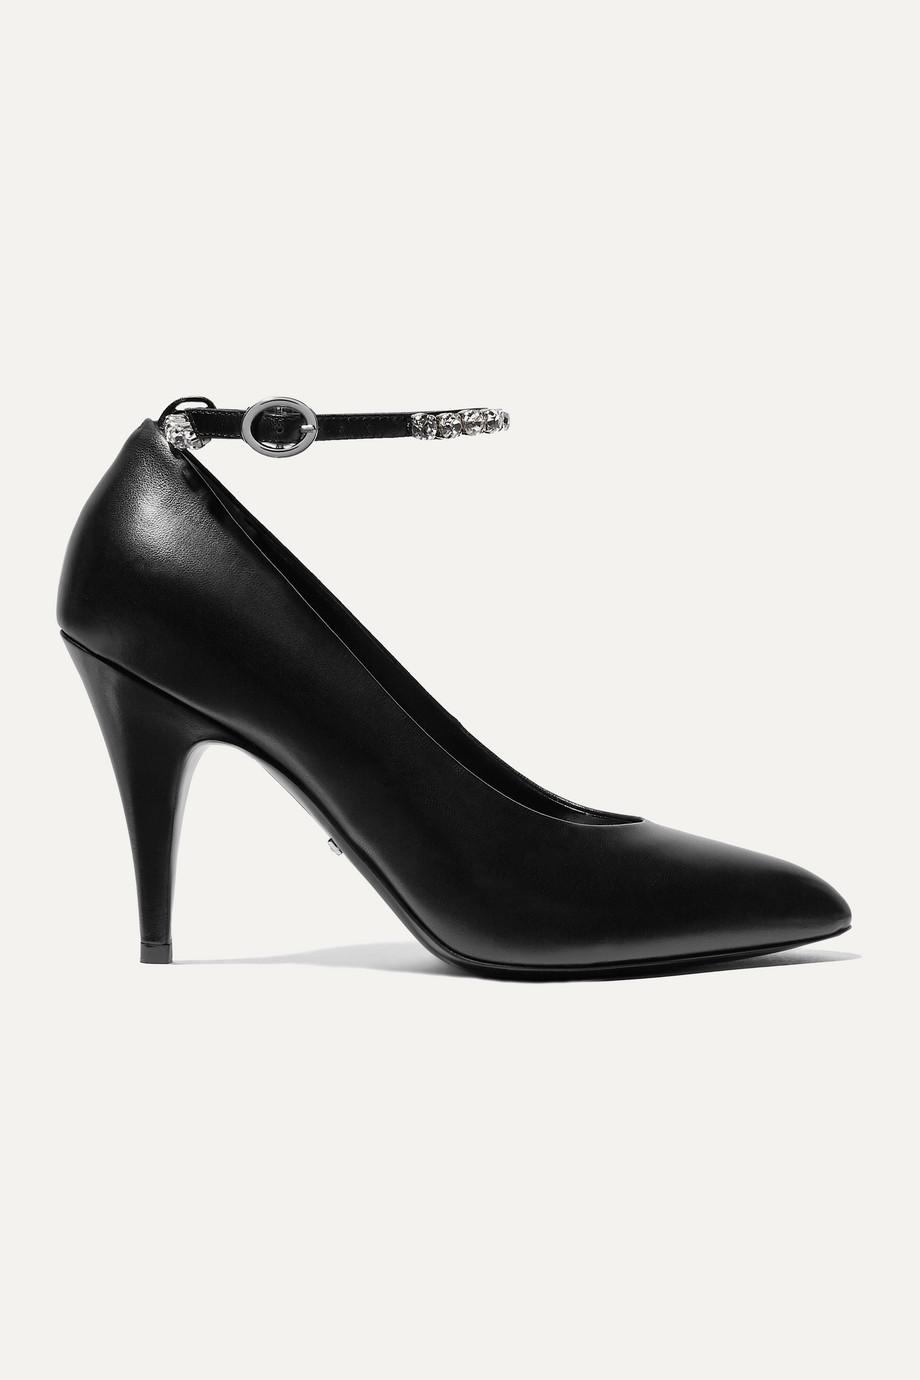 Gucci Crystal-embellished leather pumps